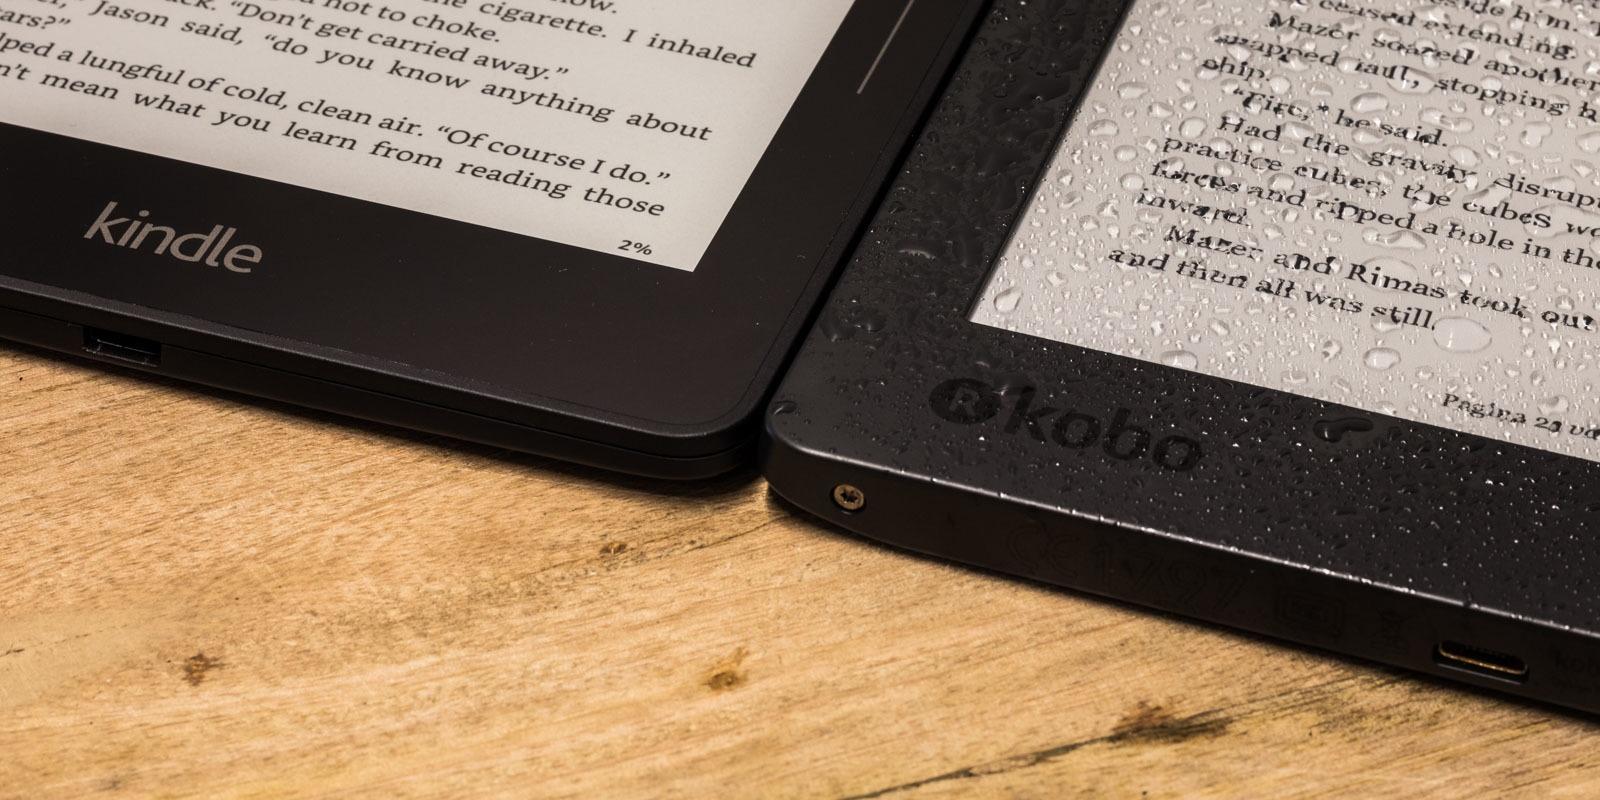 Premium-e-readers vergeleken - Review - Tweakers